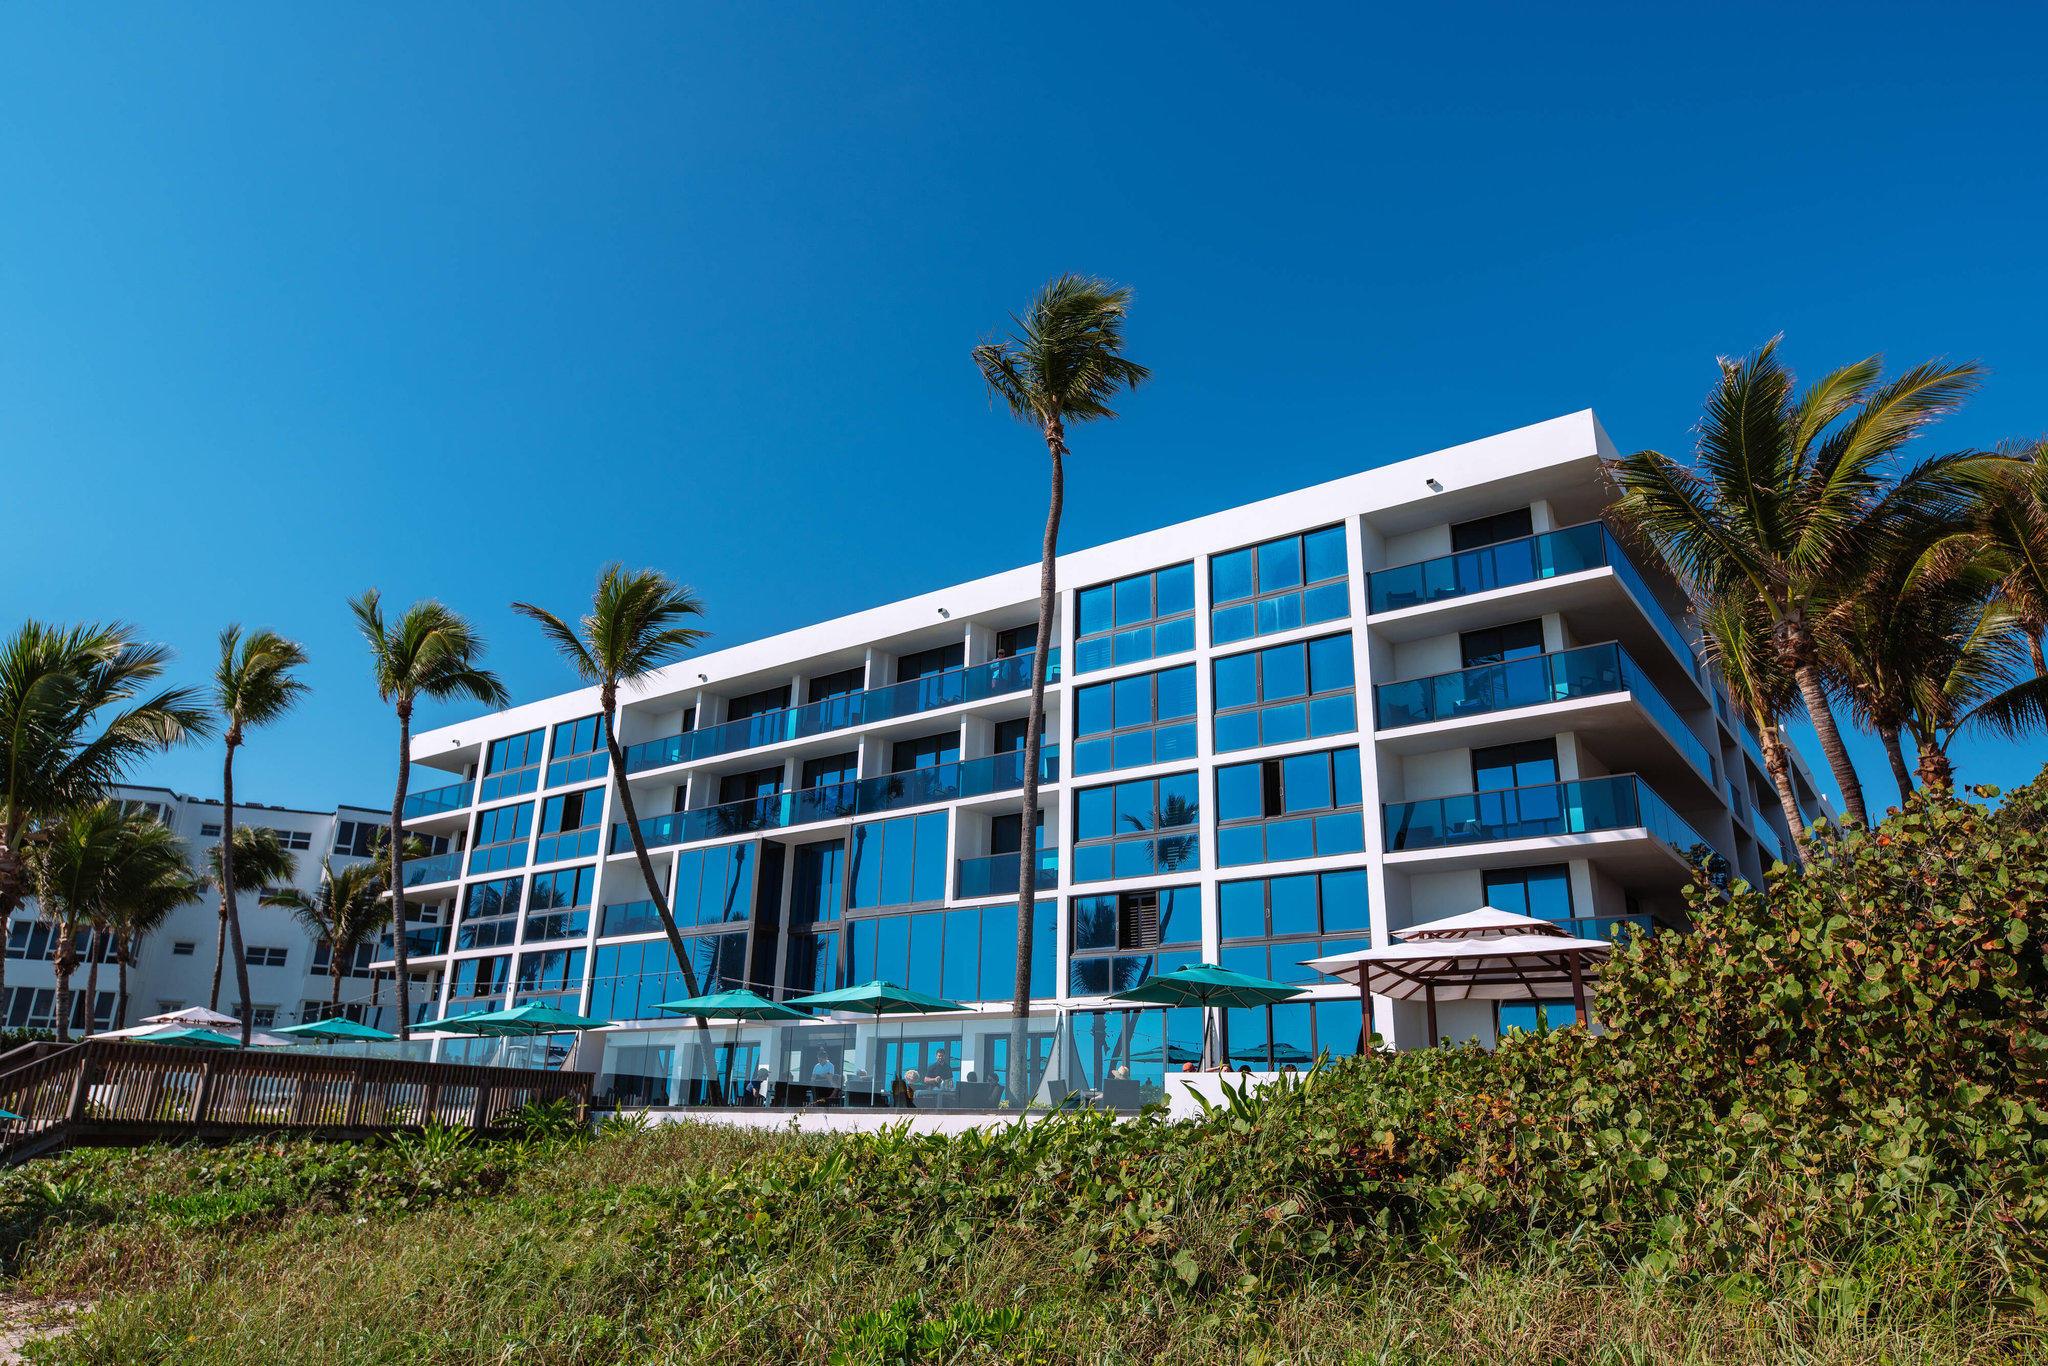 Tideline Ocean Resort & Spa - Palm Beach, FL 33480 - (561)540-6440 | ShowMeLocal.com